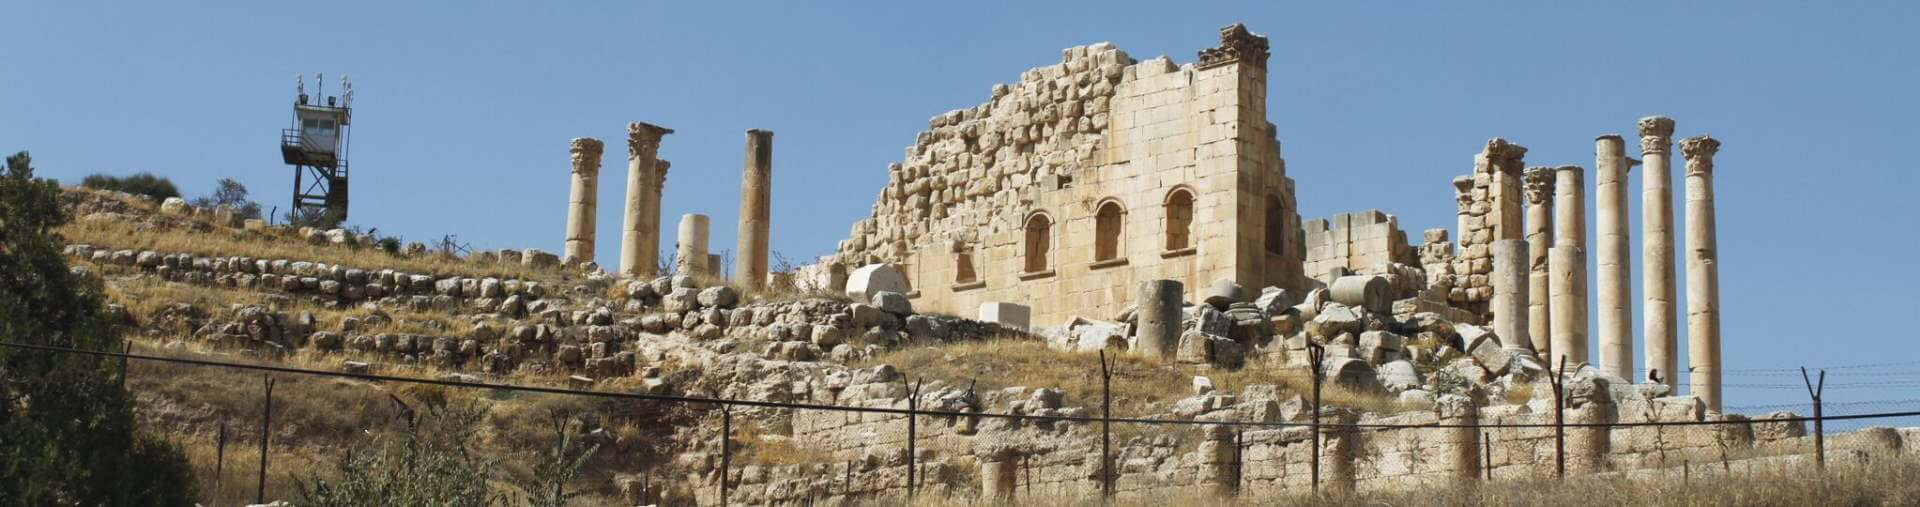 Jerash petra